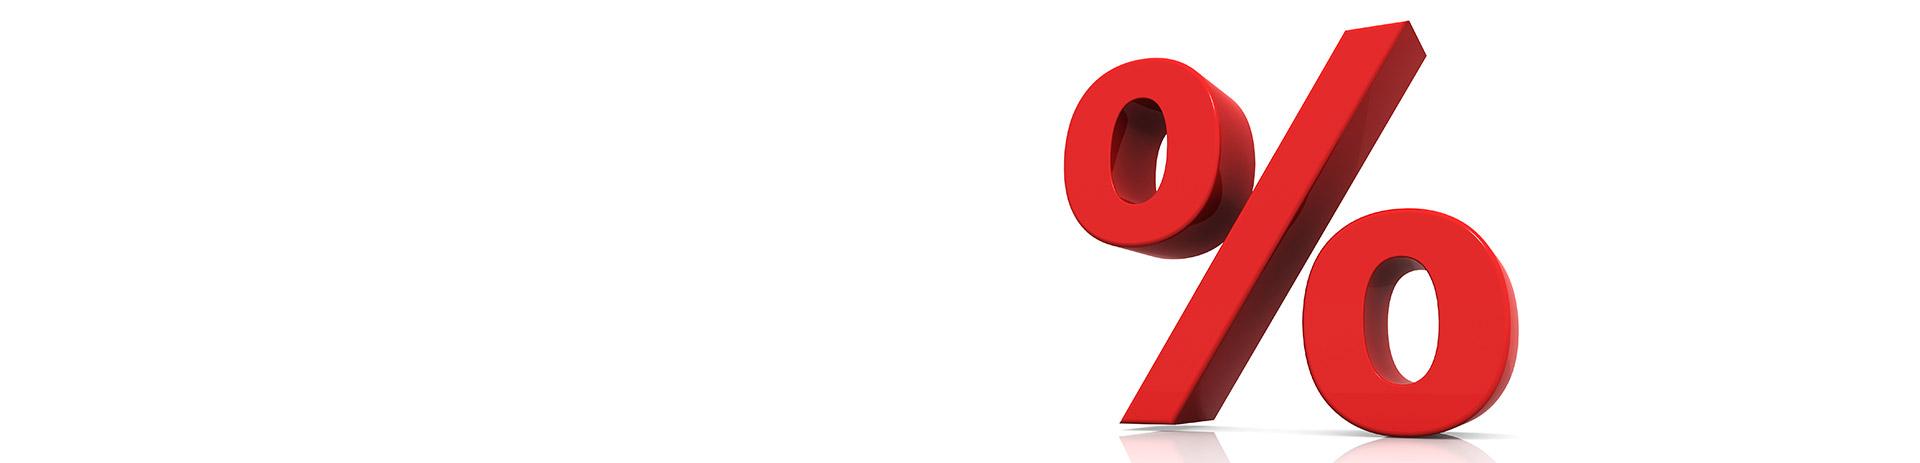 20 Prozent Online-Bonus auf A1 Go! Business Tarife